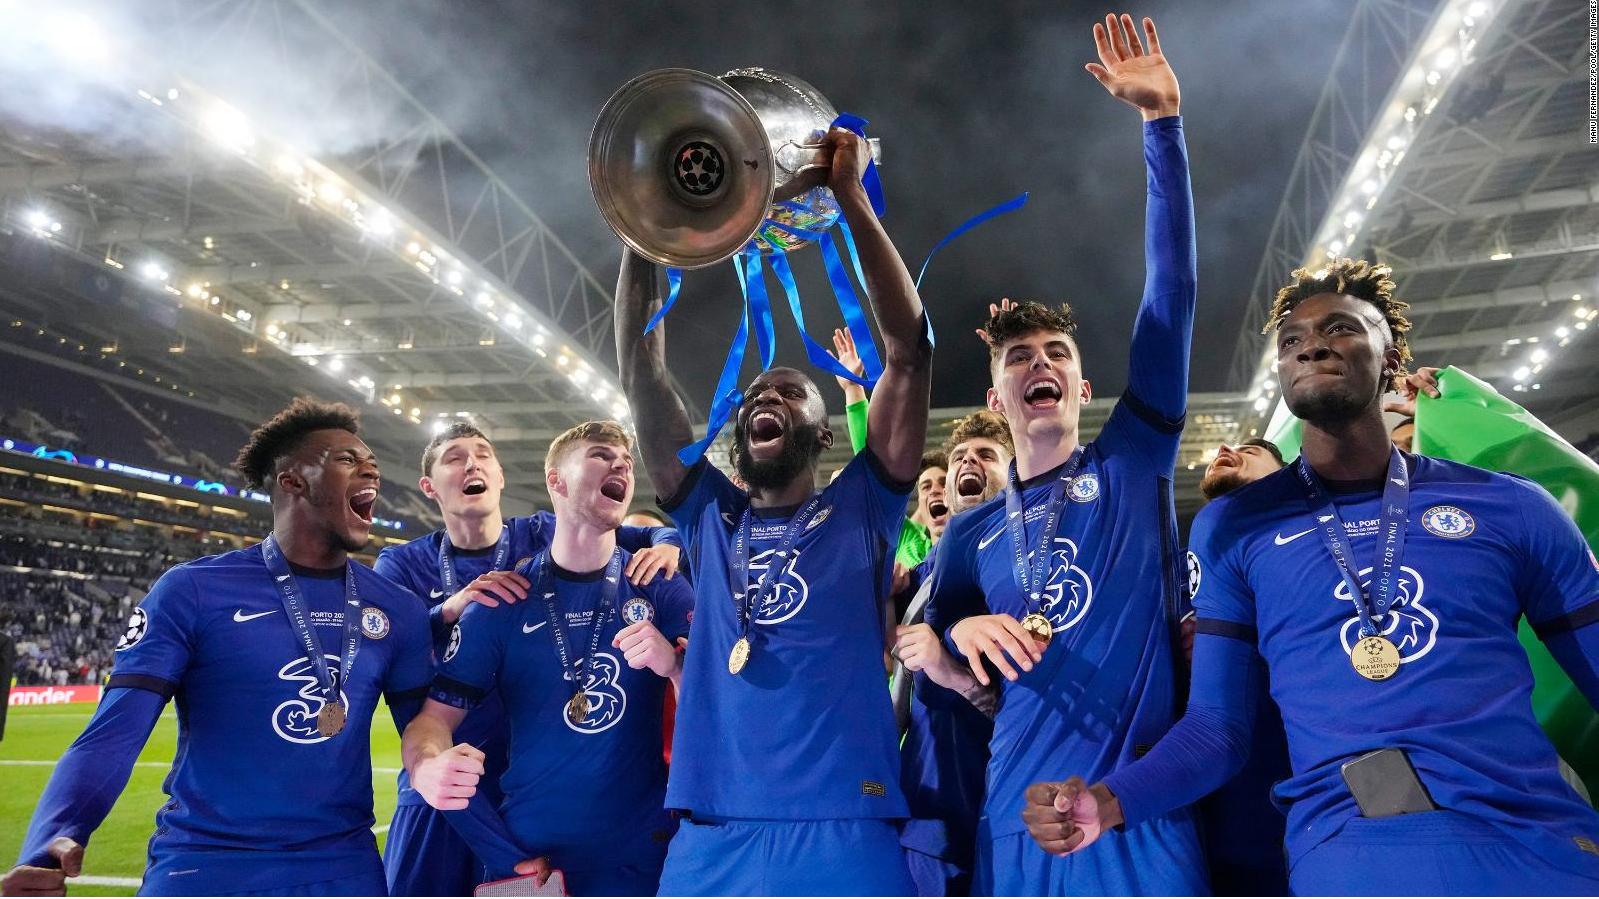 Man City vs Chelsea results